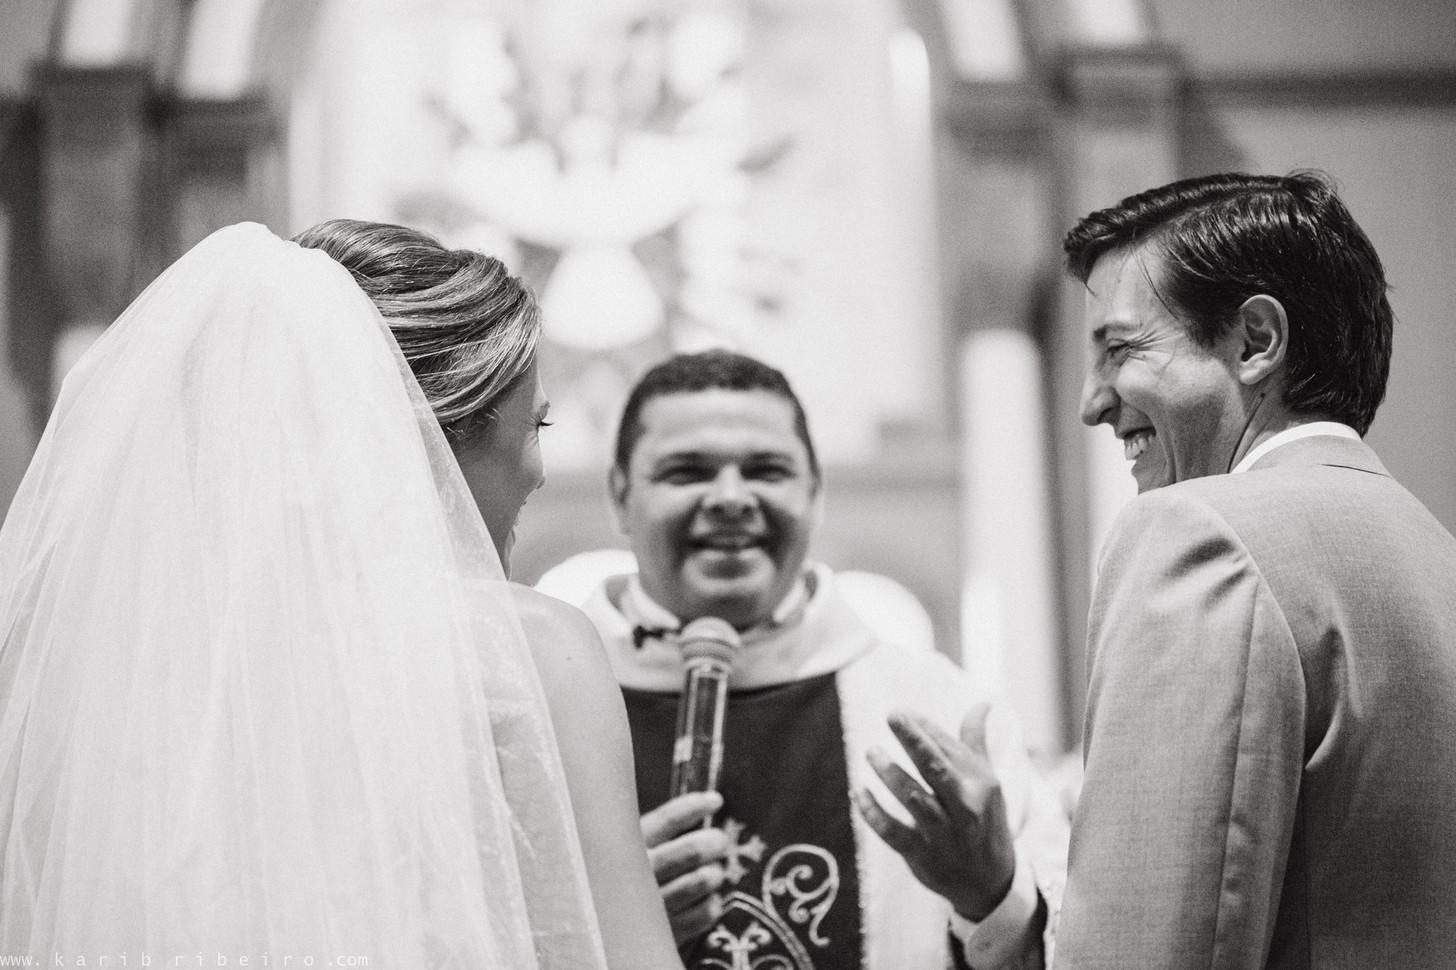 Casamento Tathy e Ale Trancoso Jun 21e 22th 2017 Igreja do Quadrado Terravista Rio da Barra Fotografo Karib Ribeiro